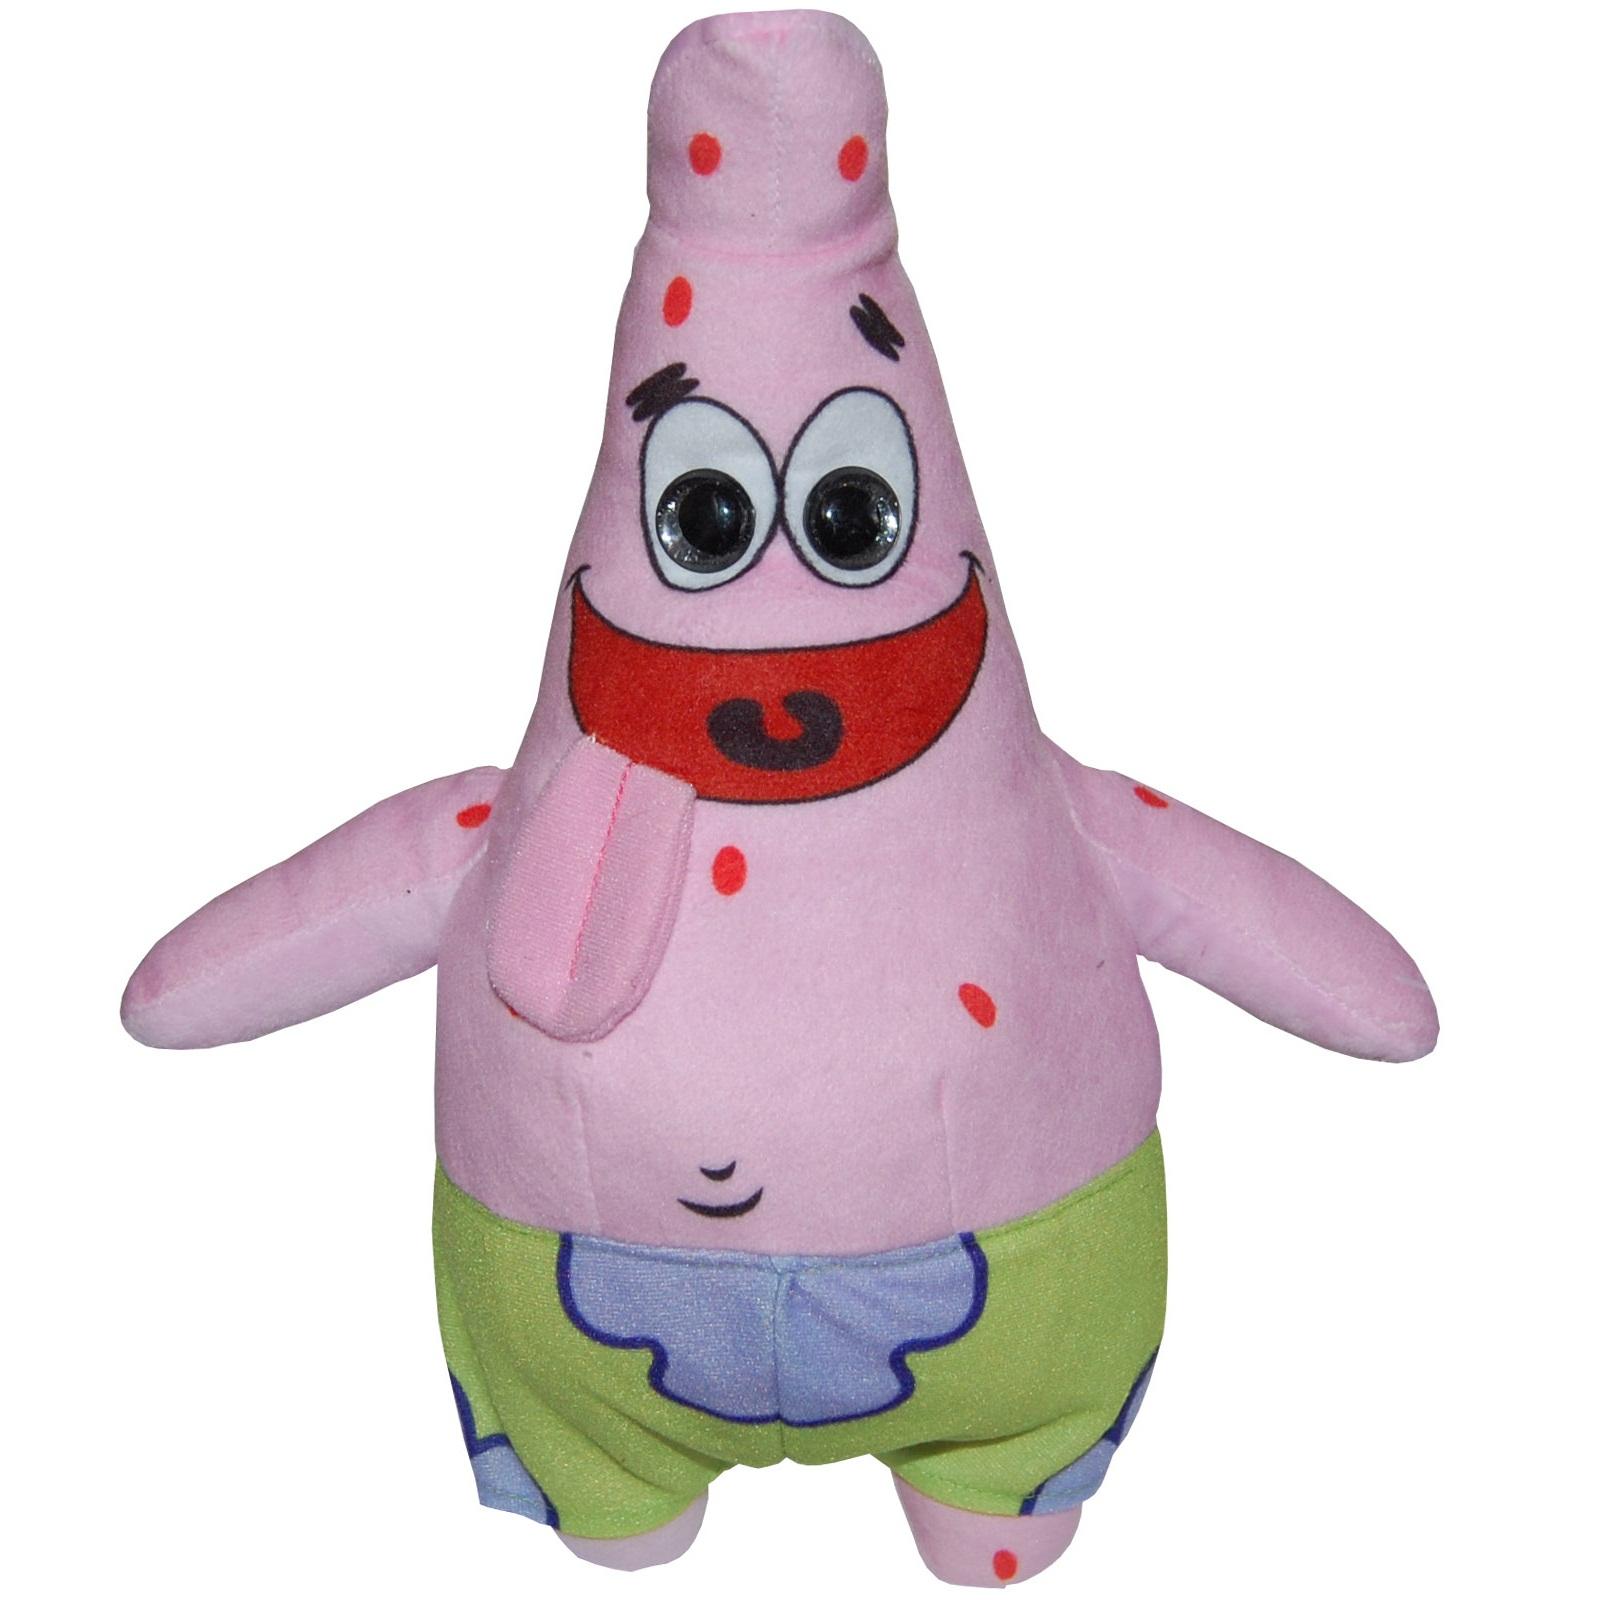 Jucarie din plus patrick star, spongebob, 30 cm